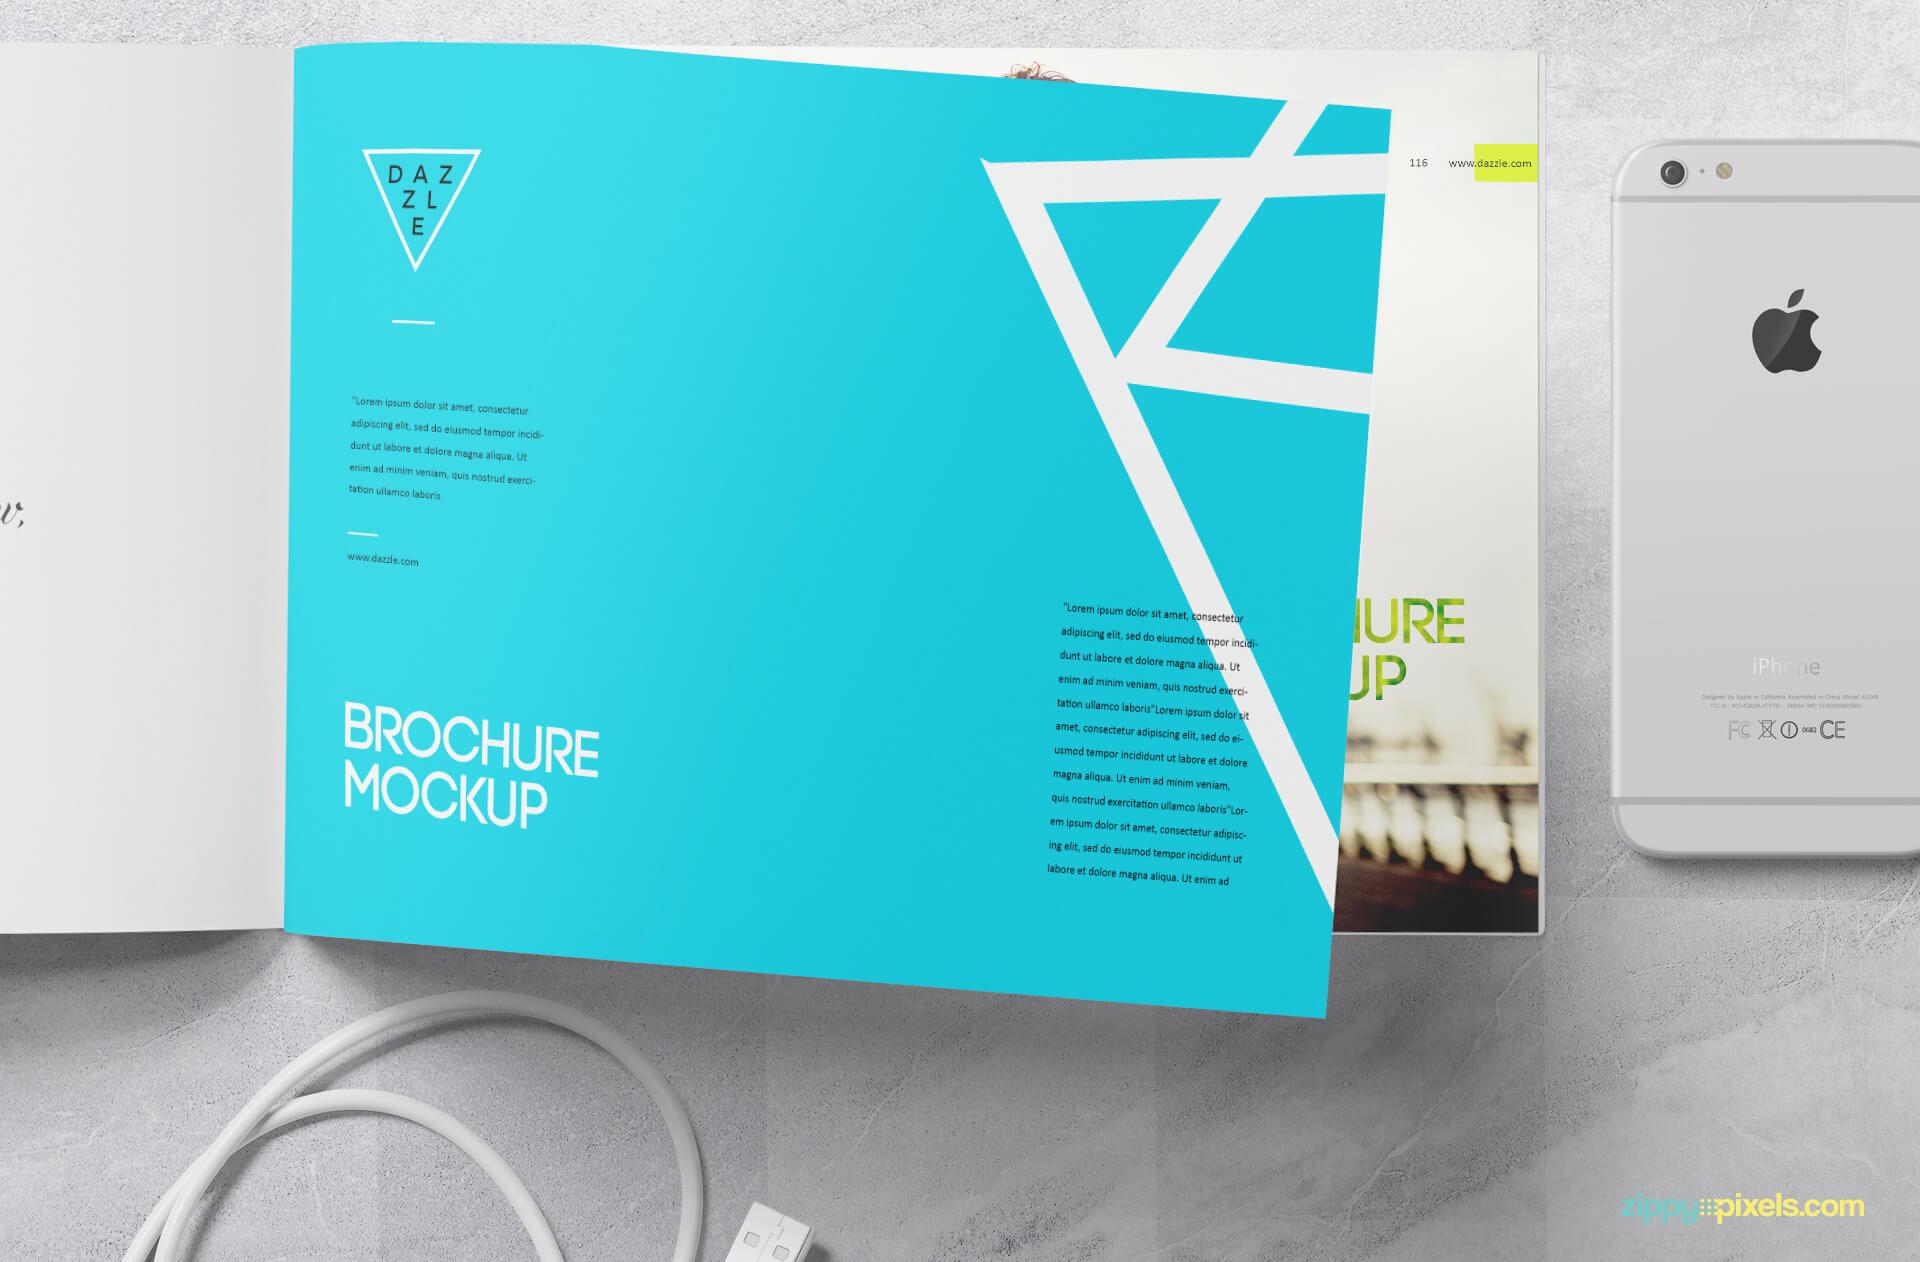 Free Designable Swift Brochure Mockup PSD Template2 (1)